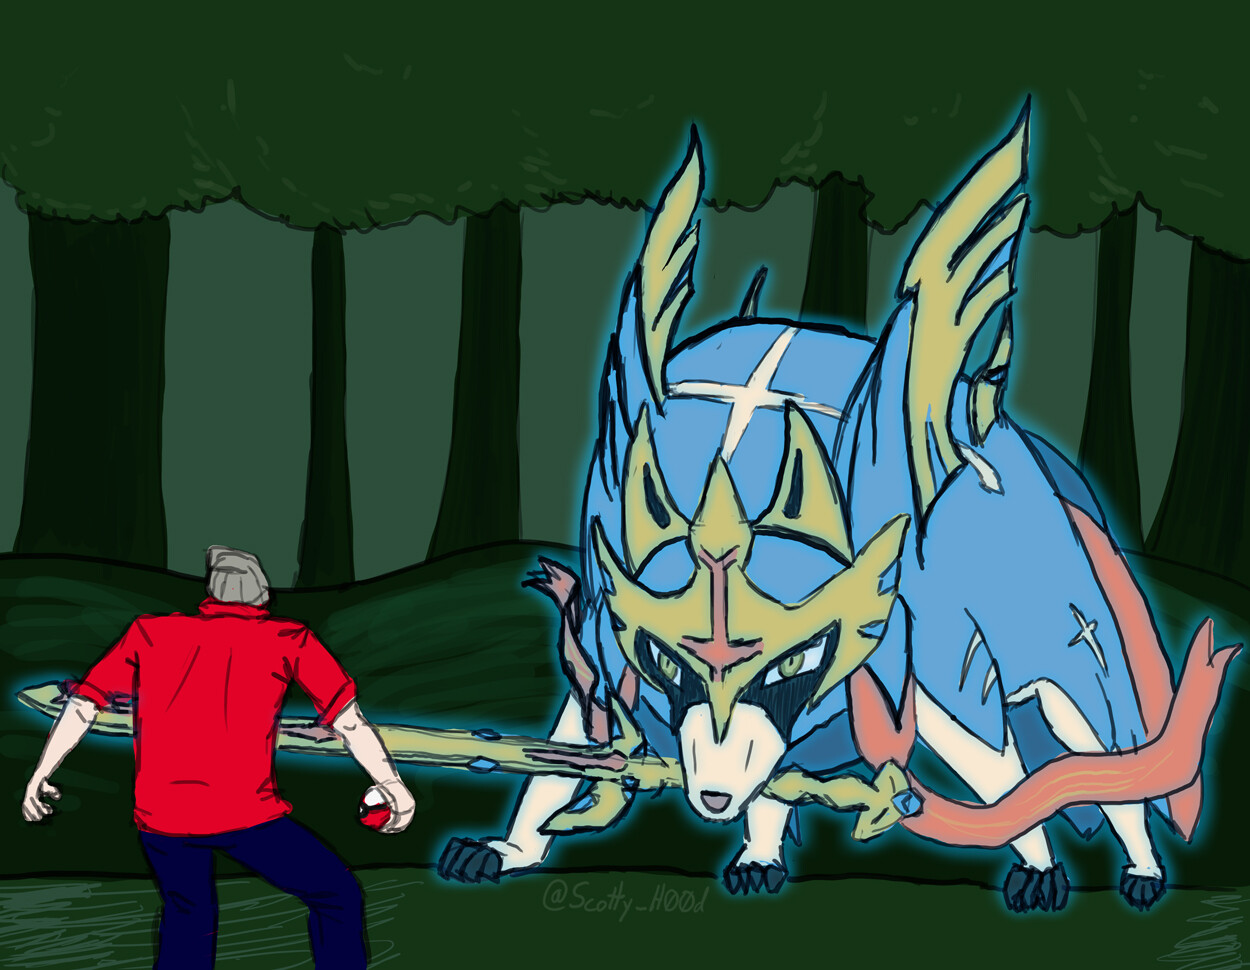 Artstation Zacion The Great Sword Pokemon Scott Borland